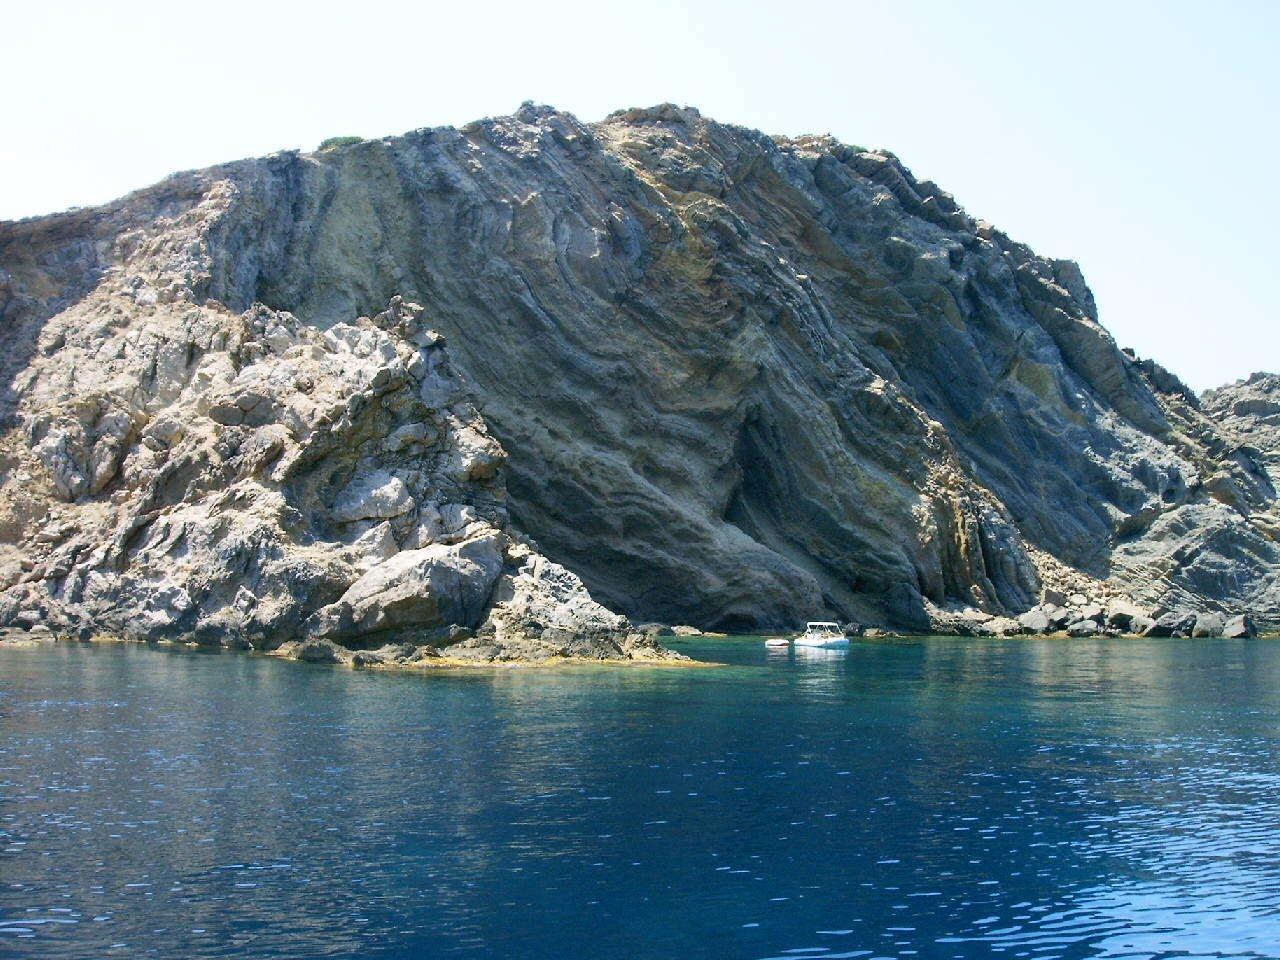 alquiler-catamaranes-ibiza-olla-de-tramontana-jpg